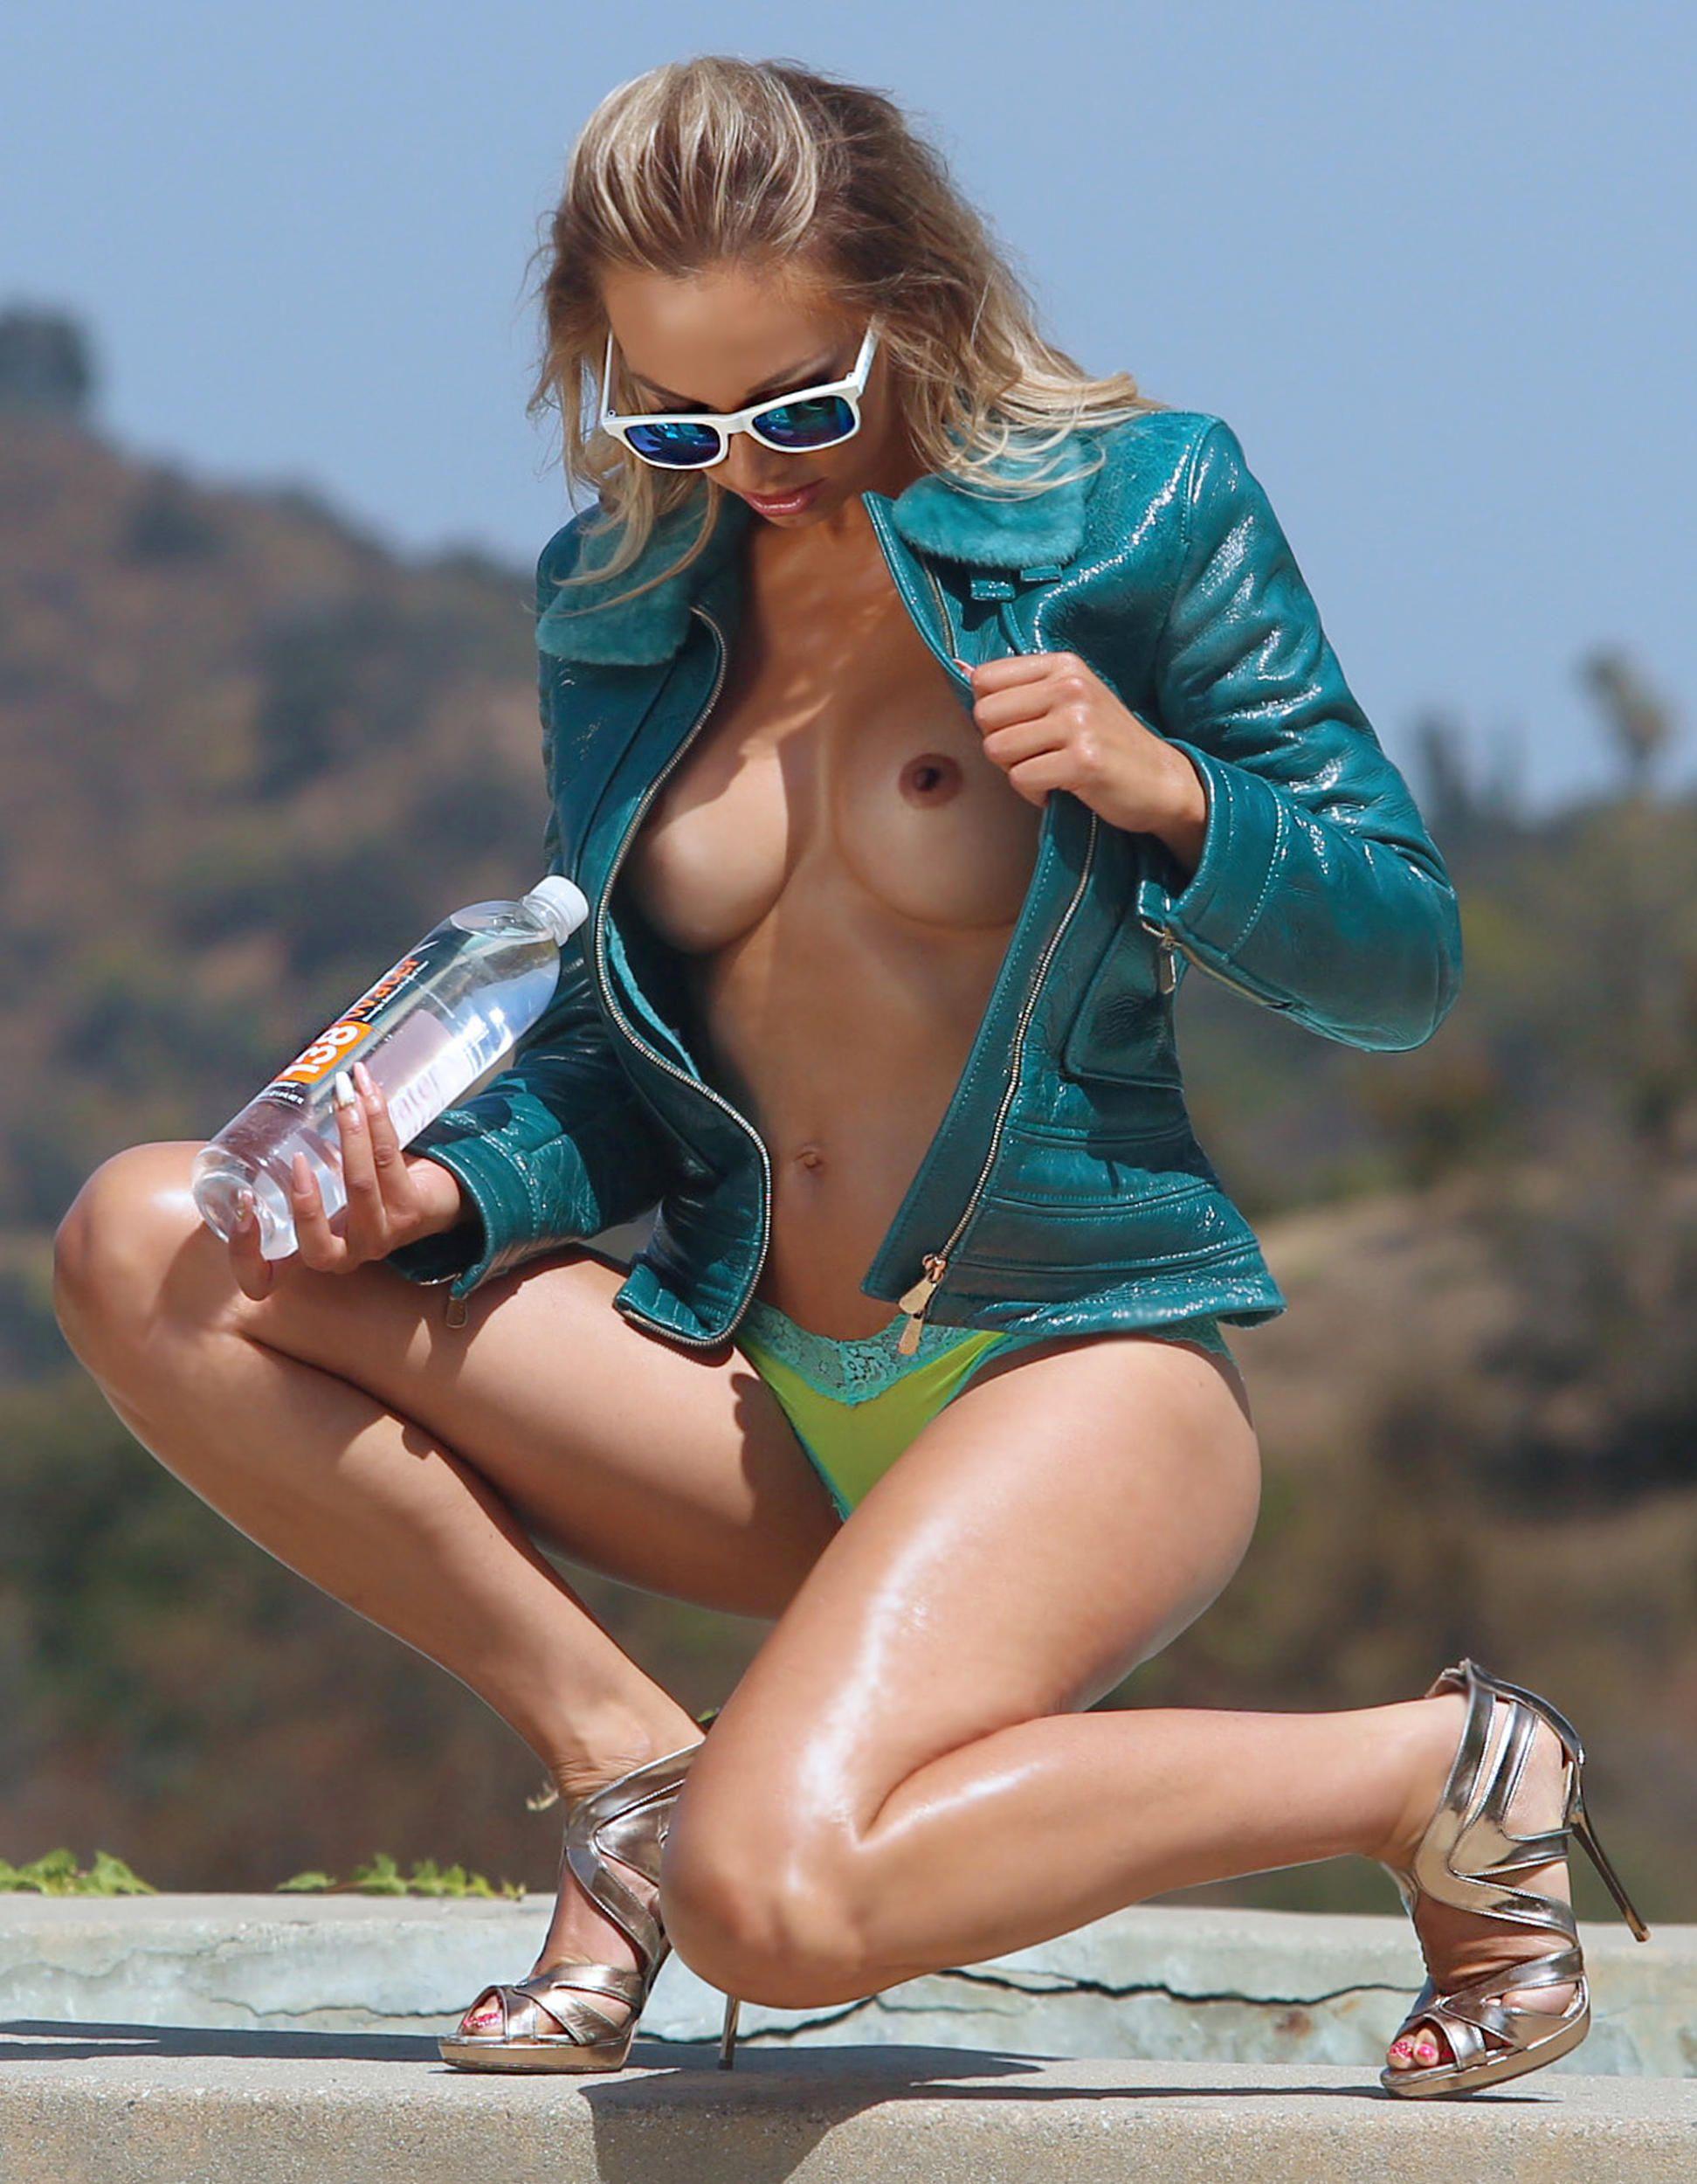 Nausicaa Sexy & Topless (26 Photos)